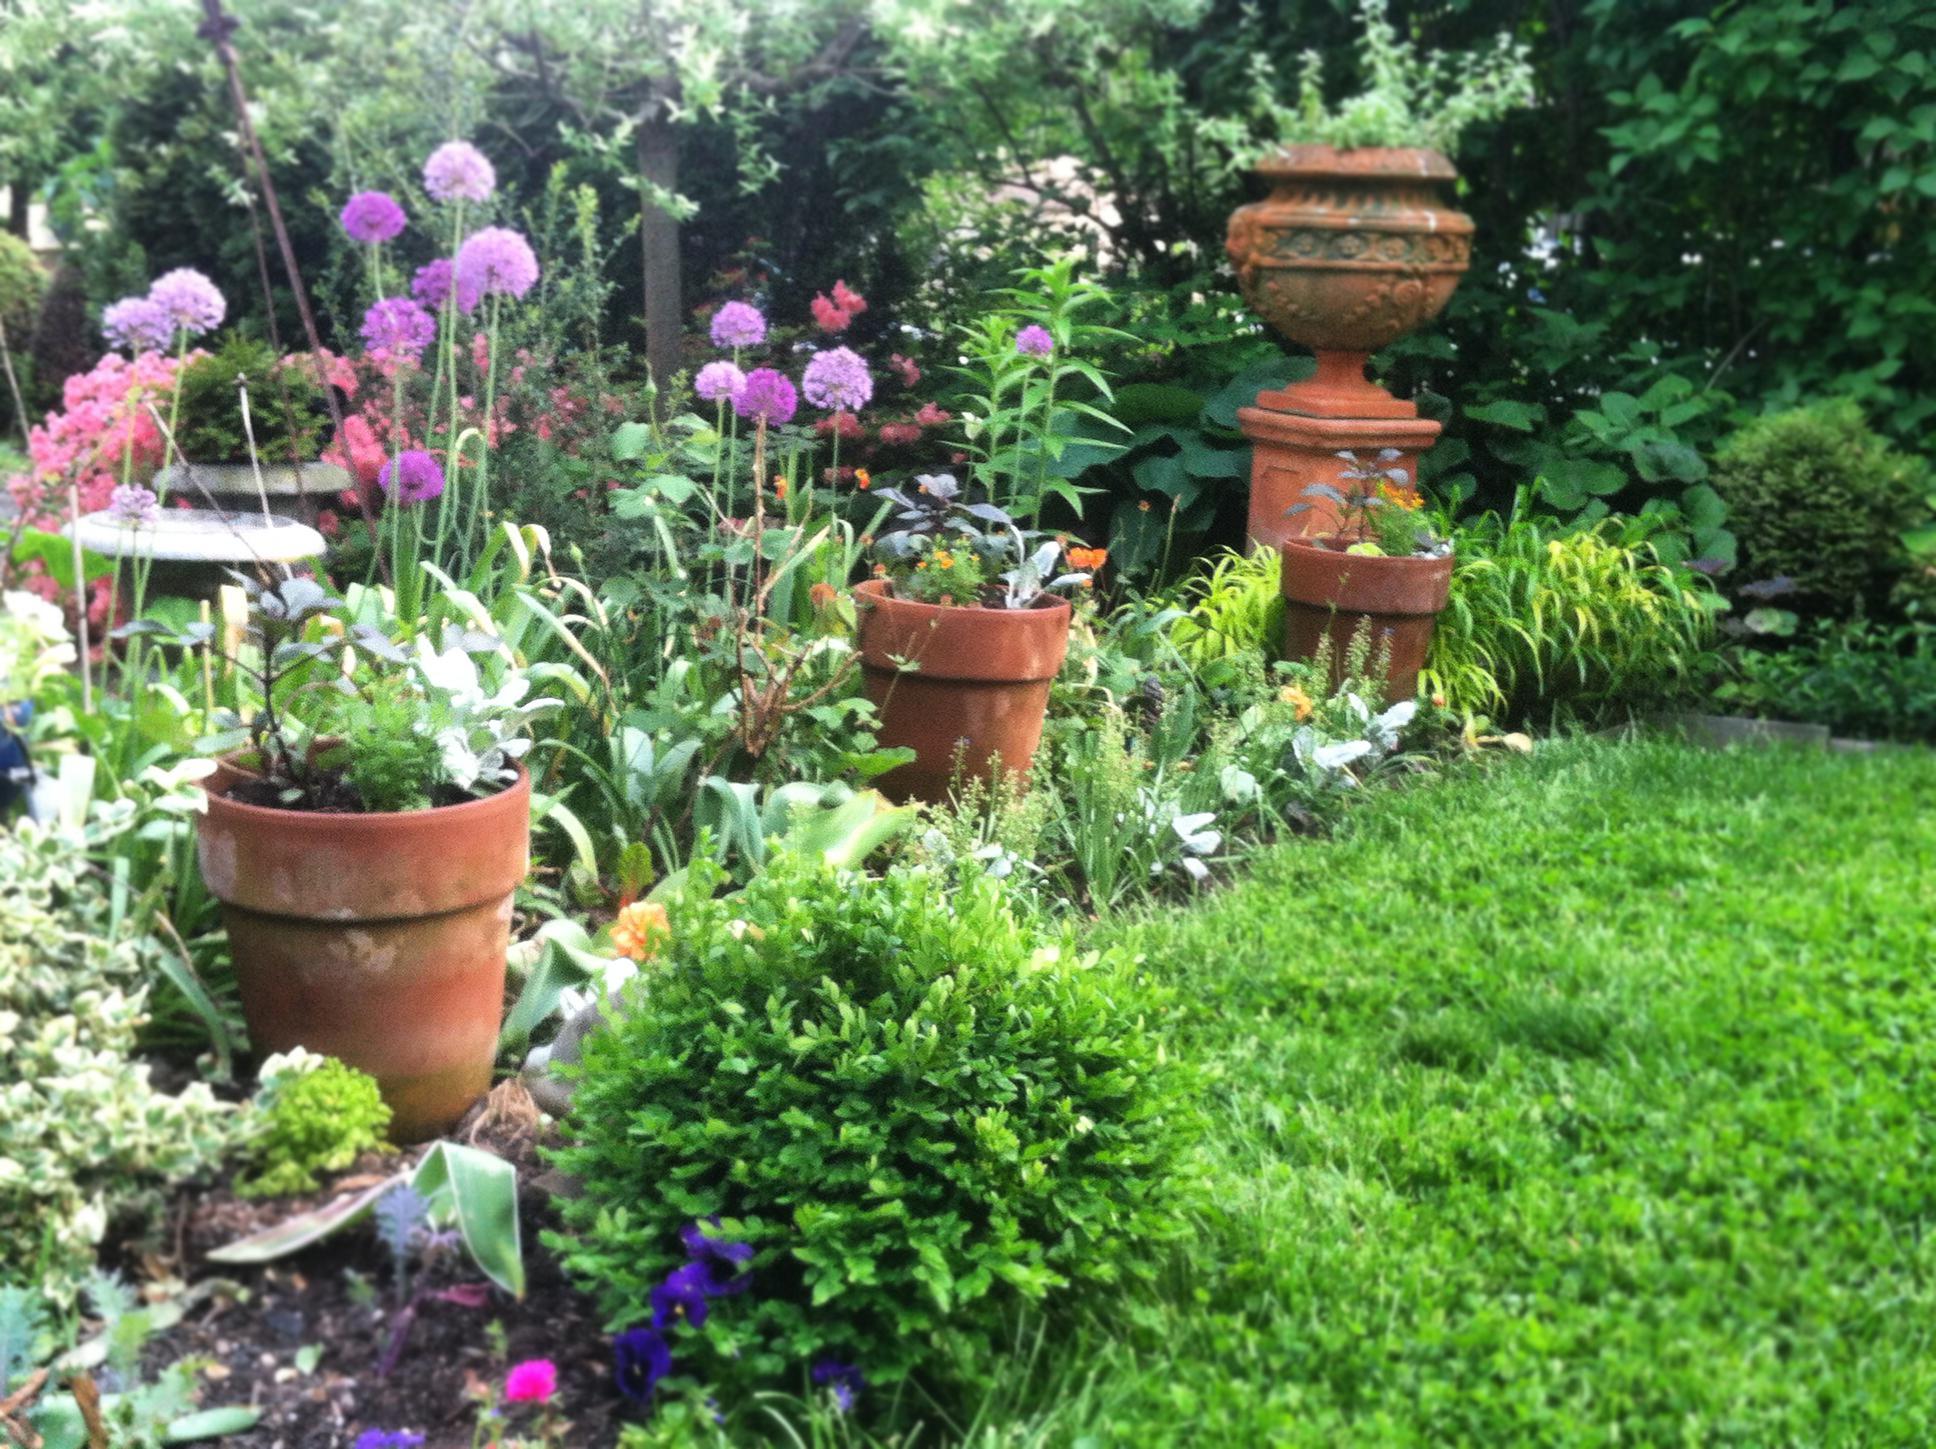 zimmer gardens residential garden design hudson valley